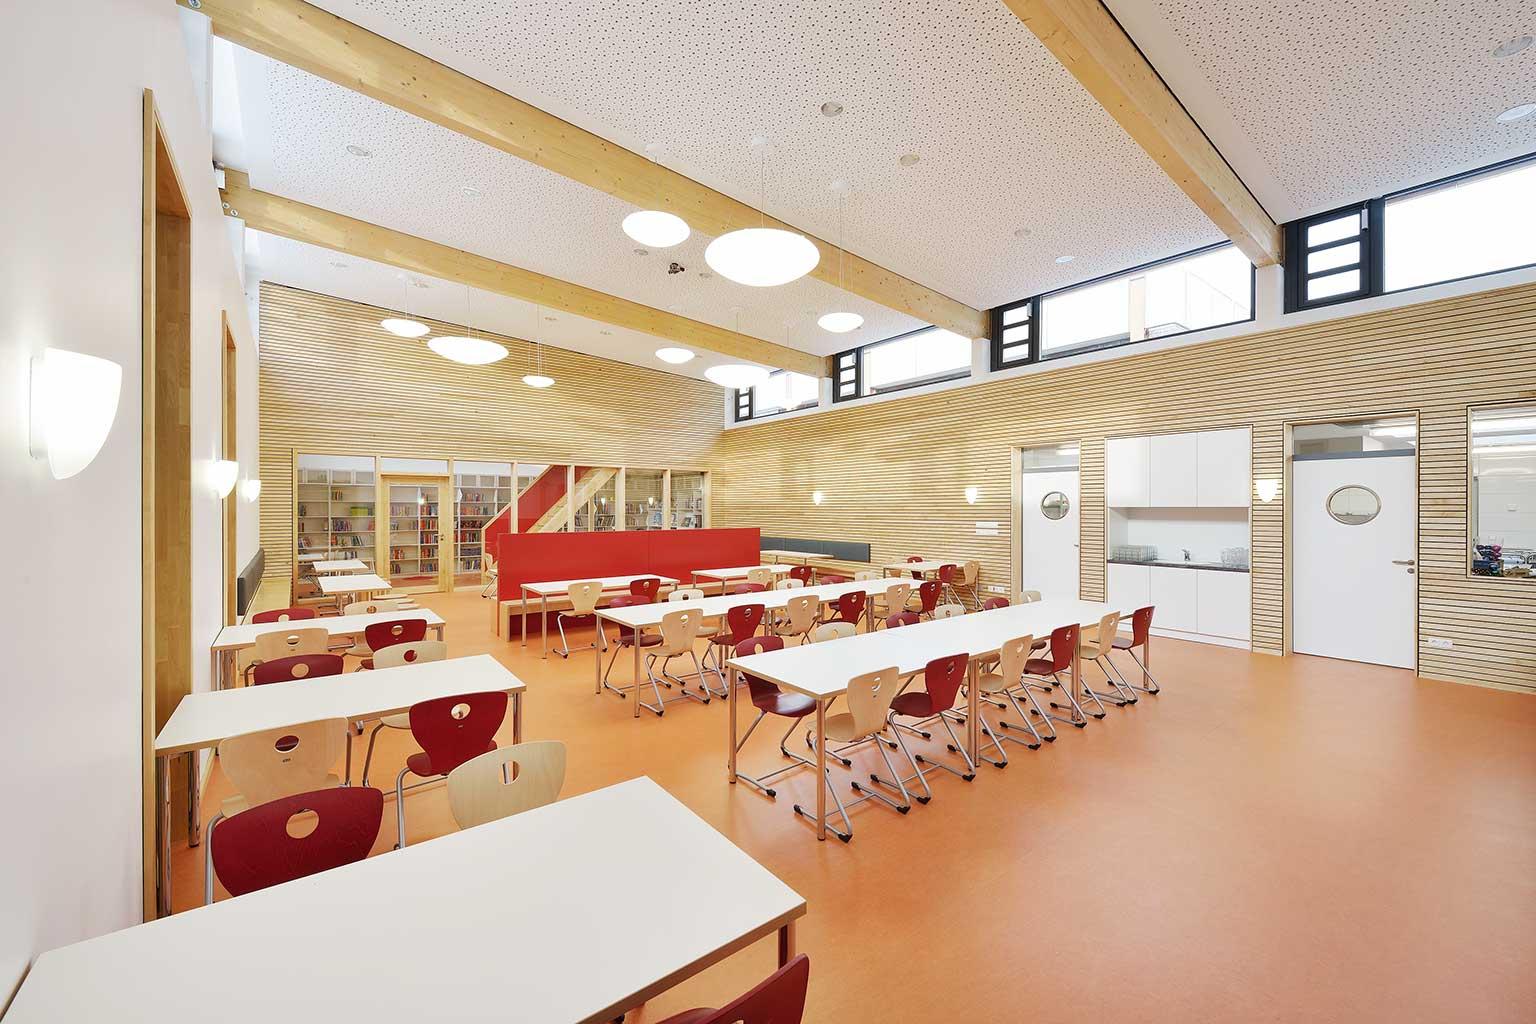 Architekturfotografie Oldenburg Bauamt Innenaufnahmen Indoor